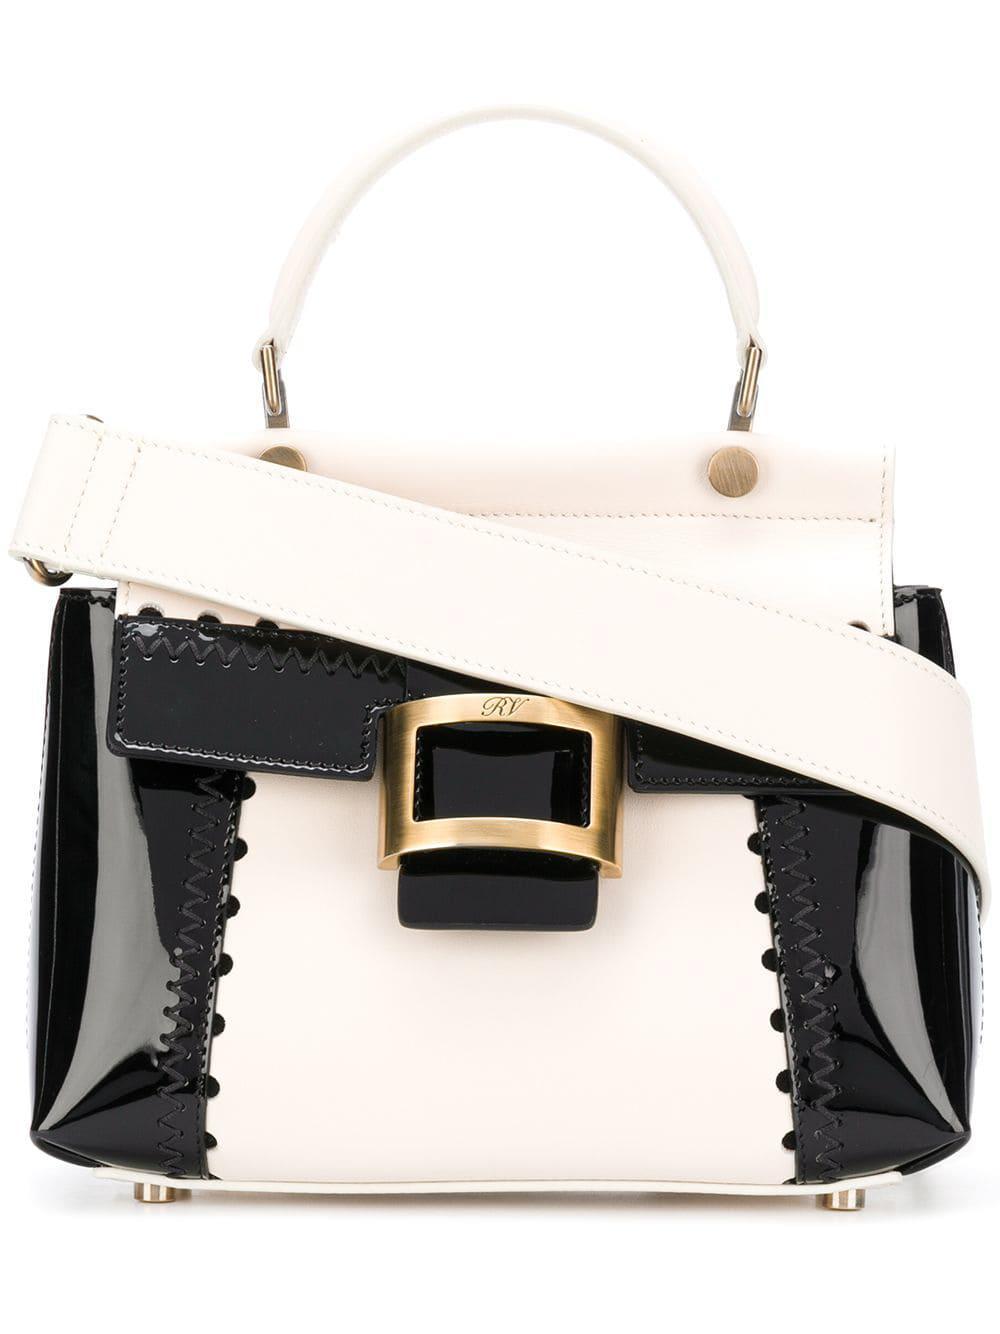 Roger Vivier Viv Cabas Mini Patent Leather Shoulder Bag in Black - Lyst 3158a7e8c0fb6